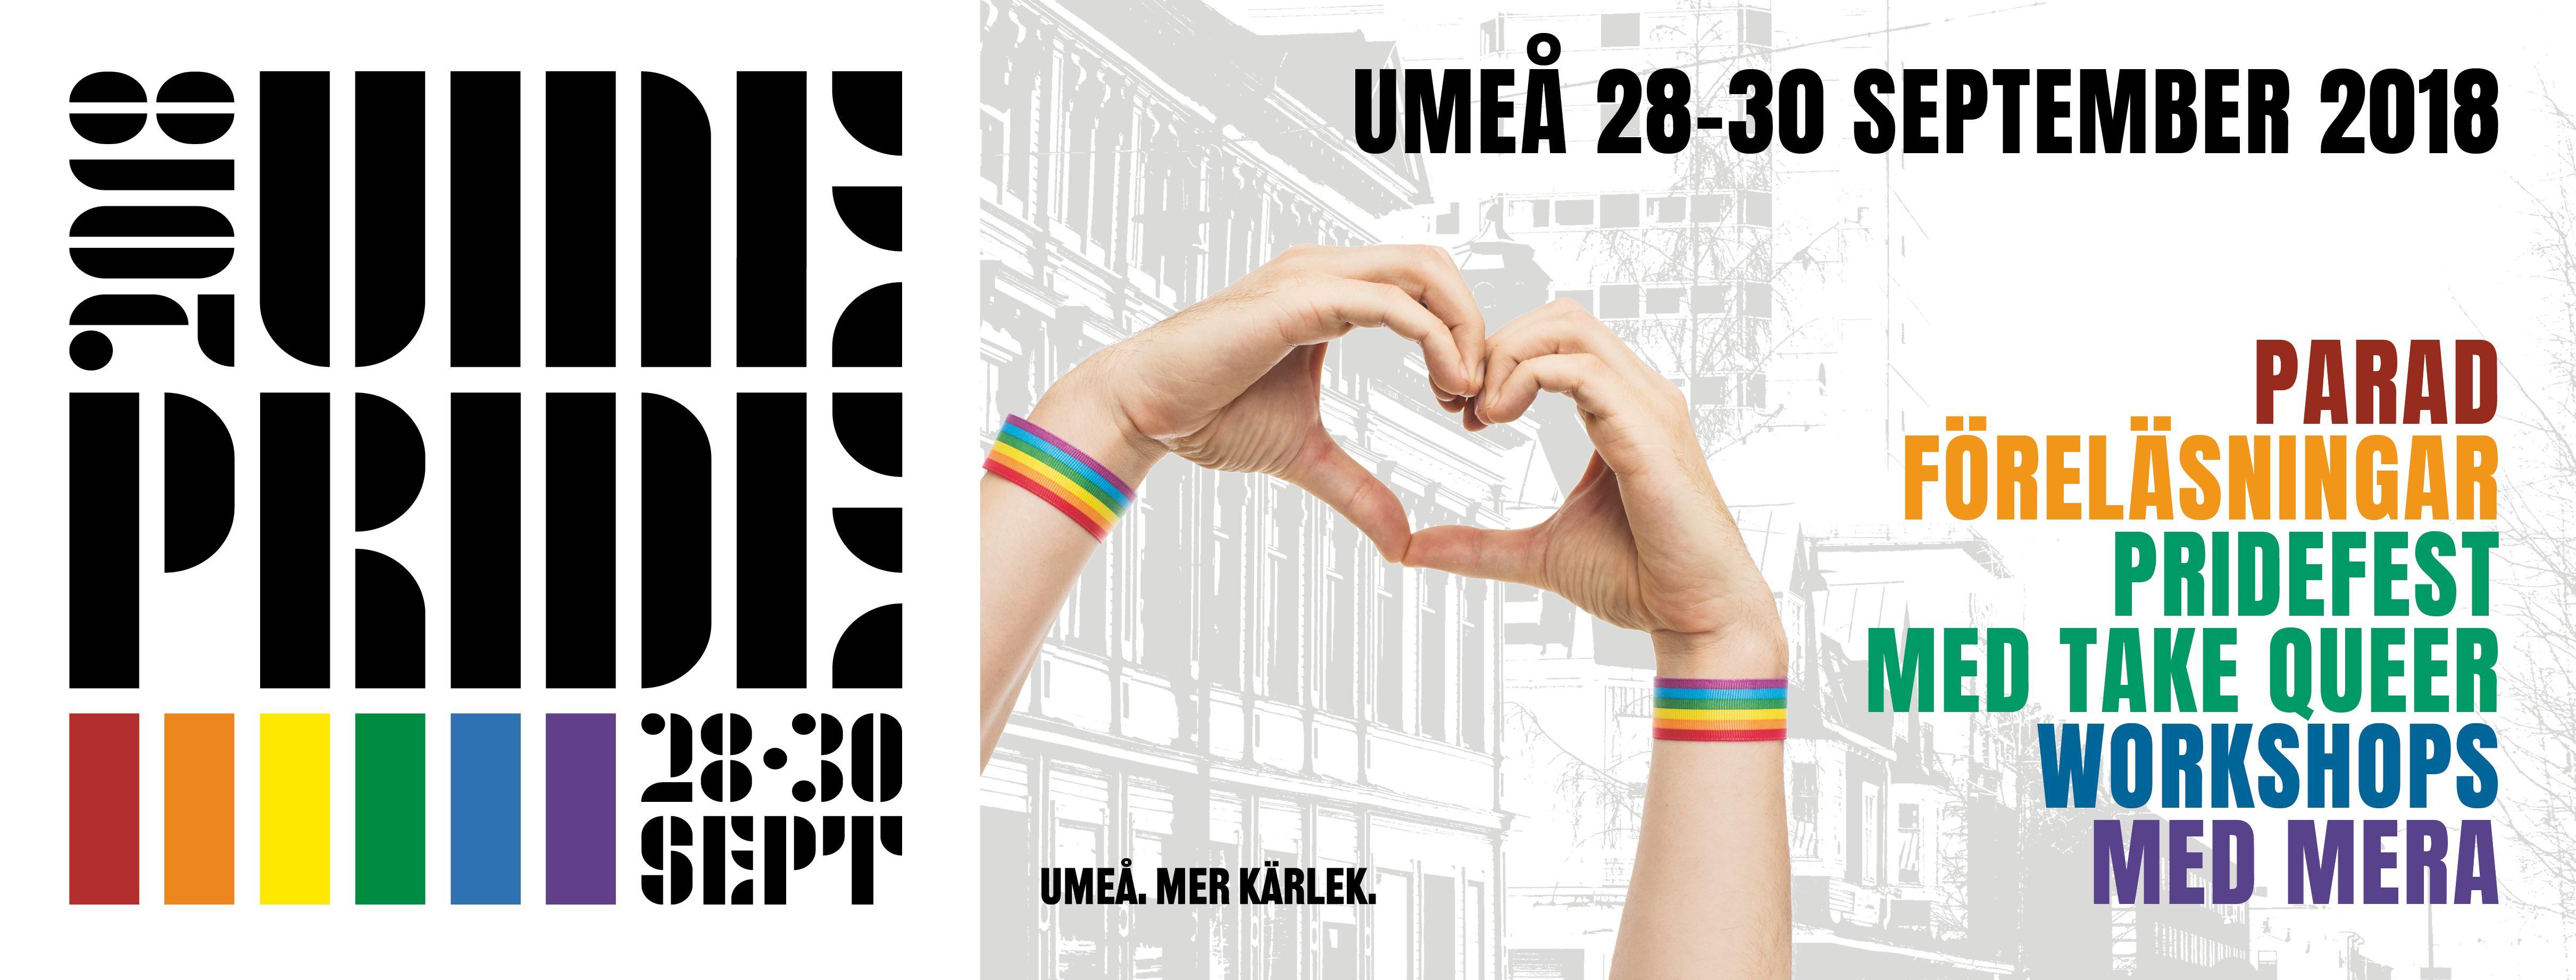 Umeå Pride 2018